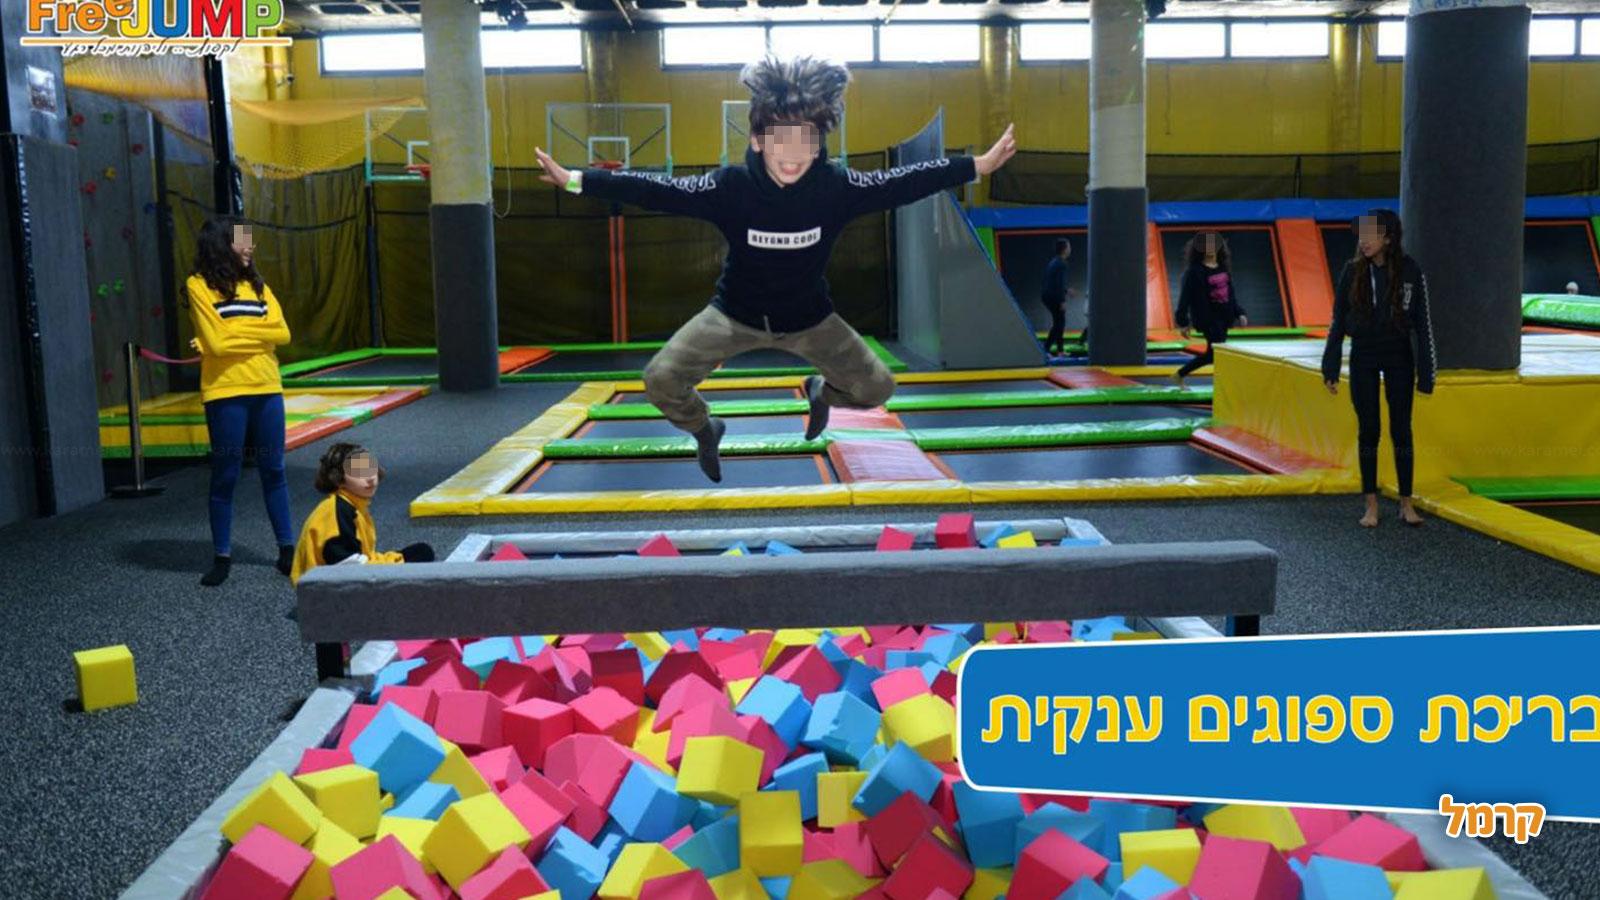 free jump - פארק טרמפולינות - 073-7025427